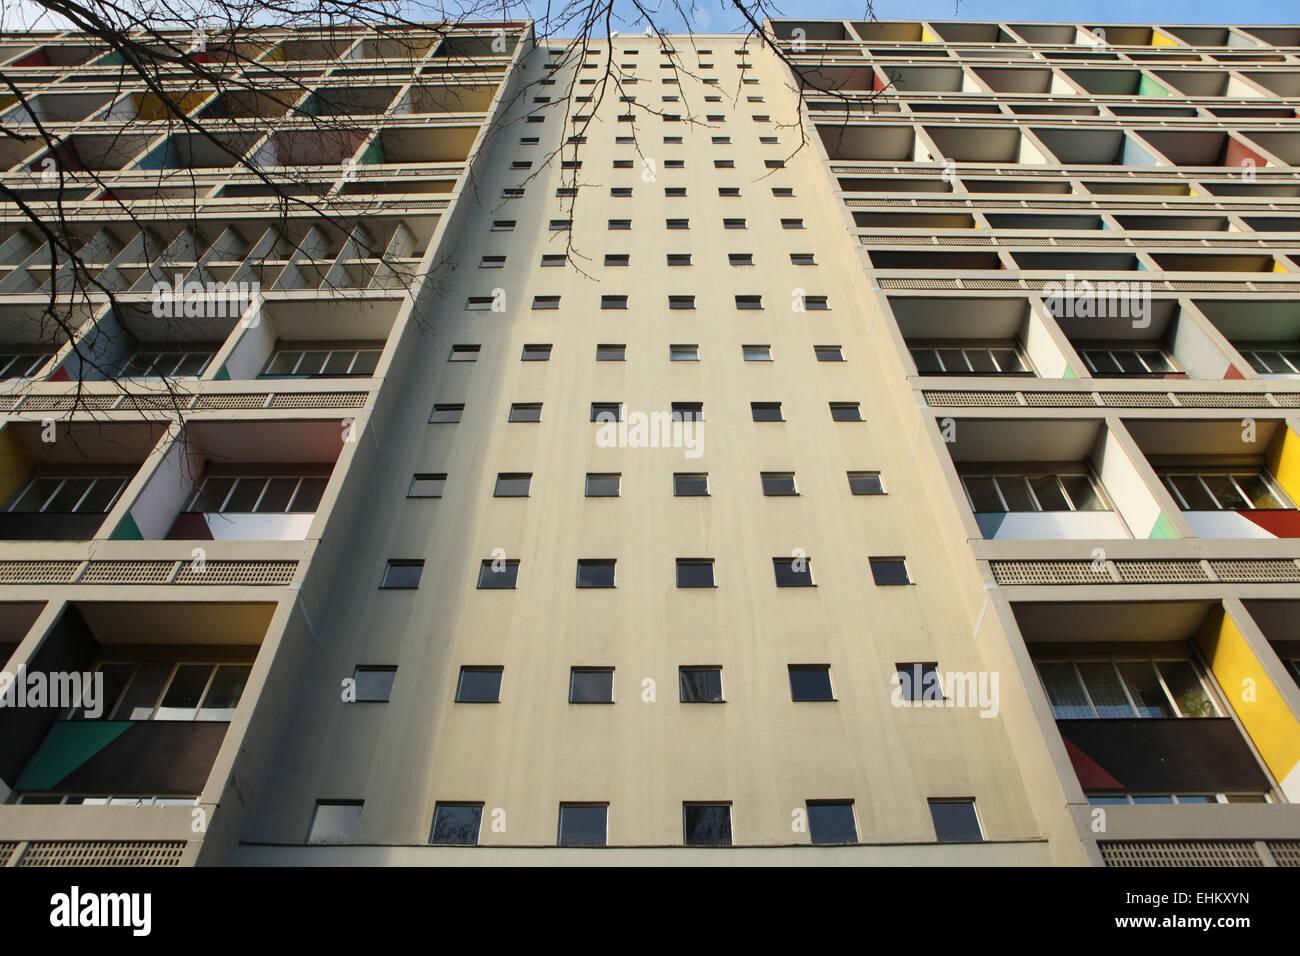 Modernist residential building Unité d'Habitation designed by architect Le Corbusier (1957) in Berlin, - Stock Image